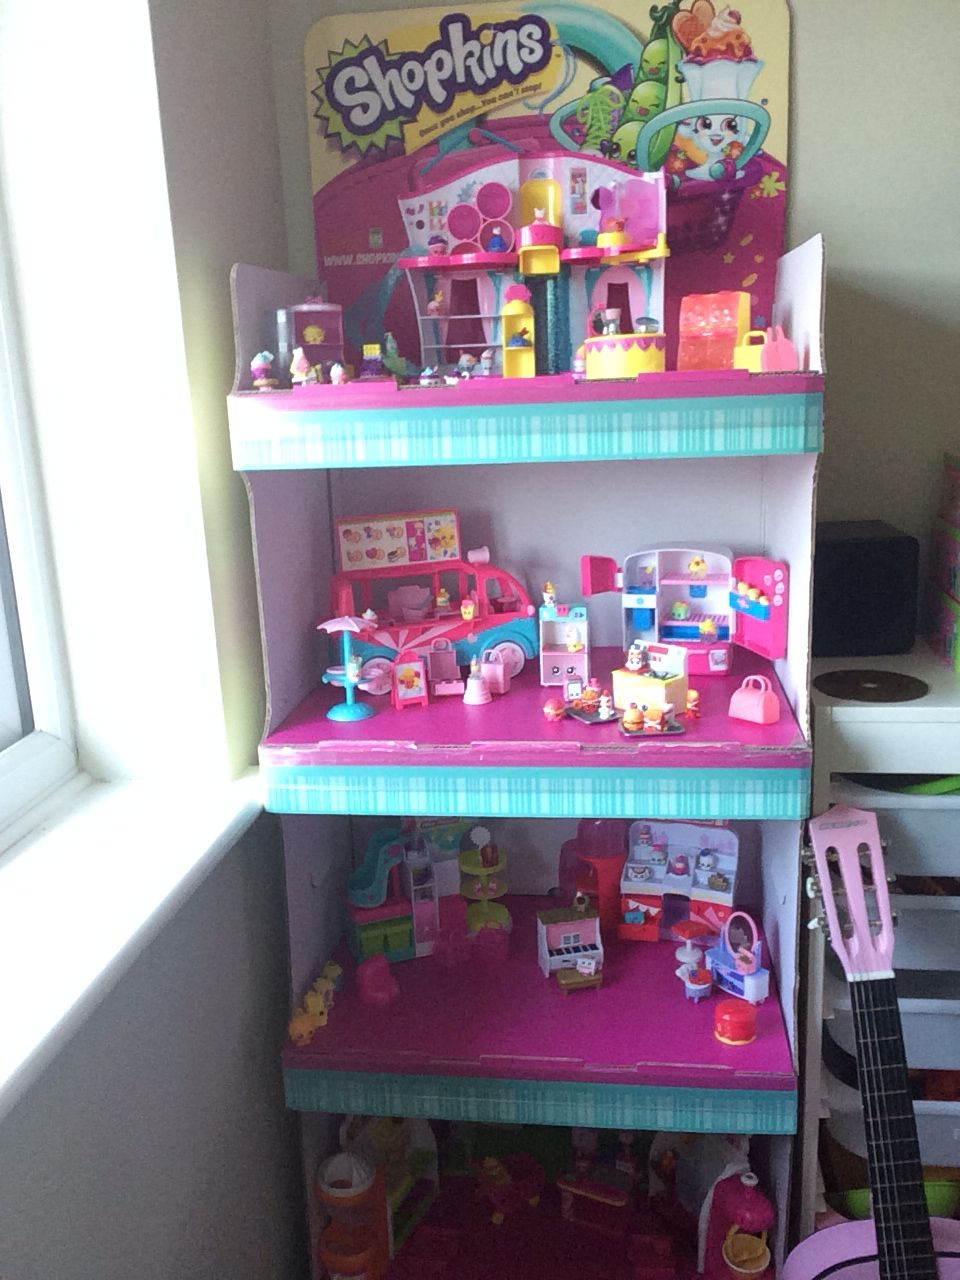 Blue Storage Kids Toy Box Playroom Furniture Bedroom Girls: Shopkins, Shoppies Dolls